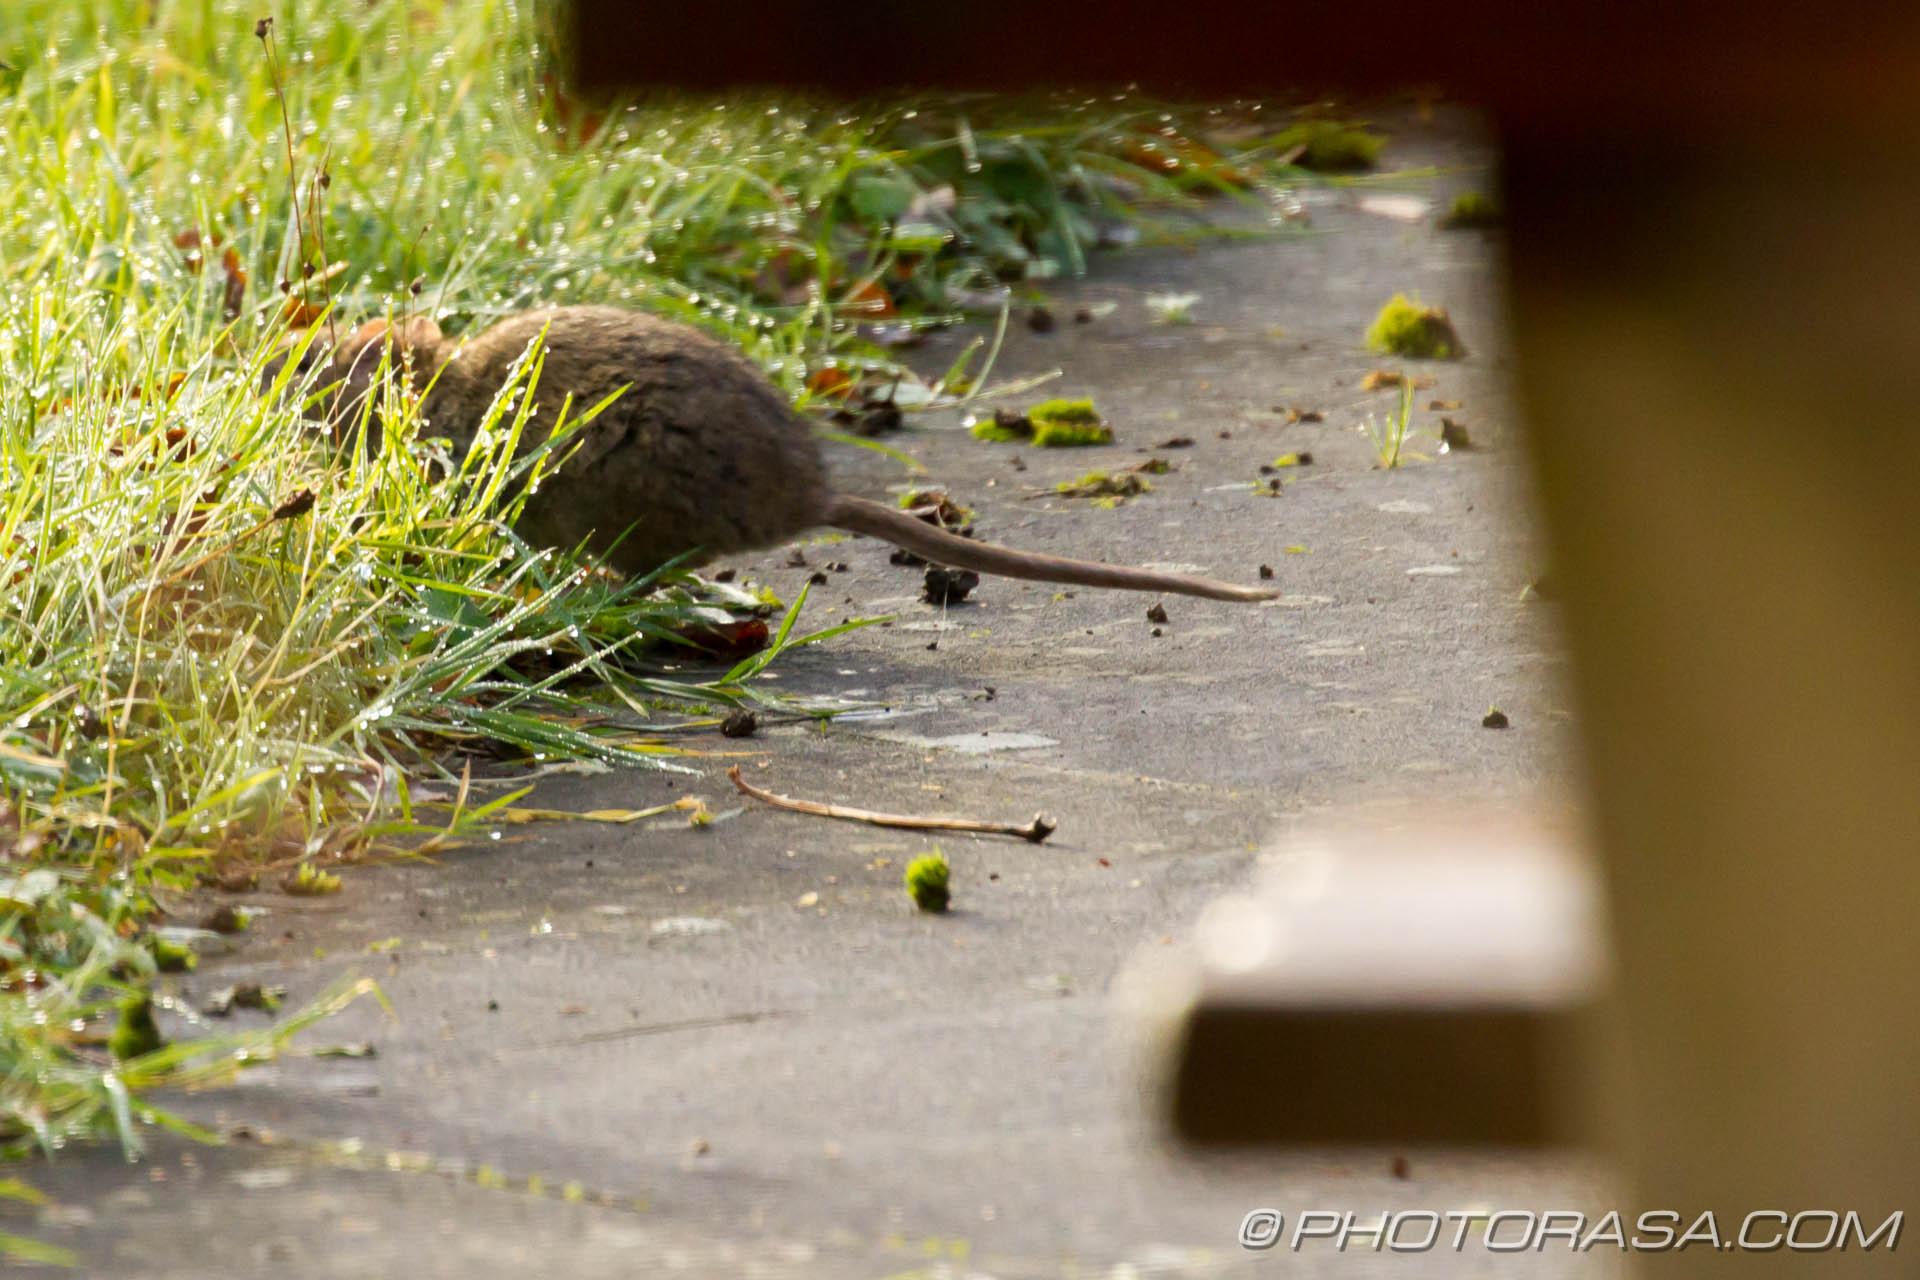 http://photorasa.com/river-rat-maidstone-market/river-rat-running-into-the-grass/